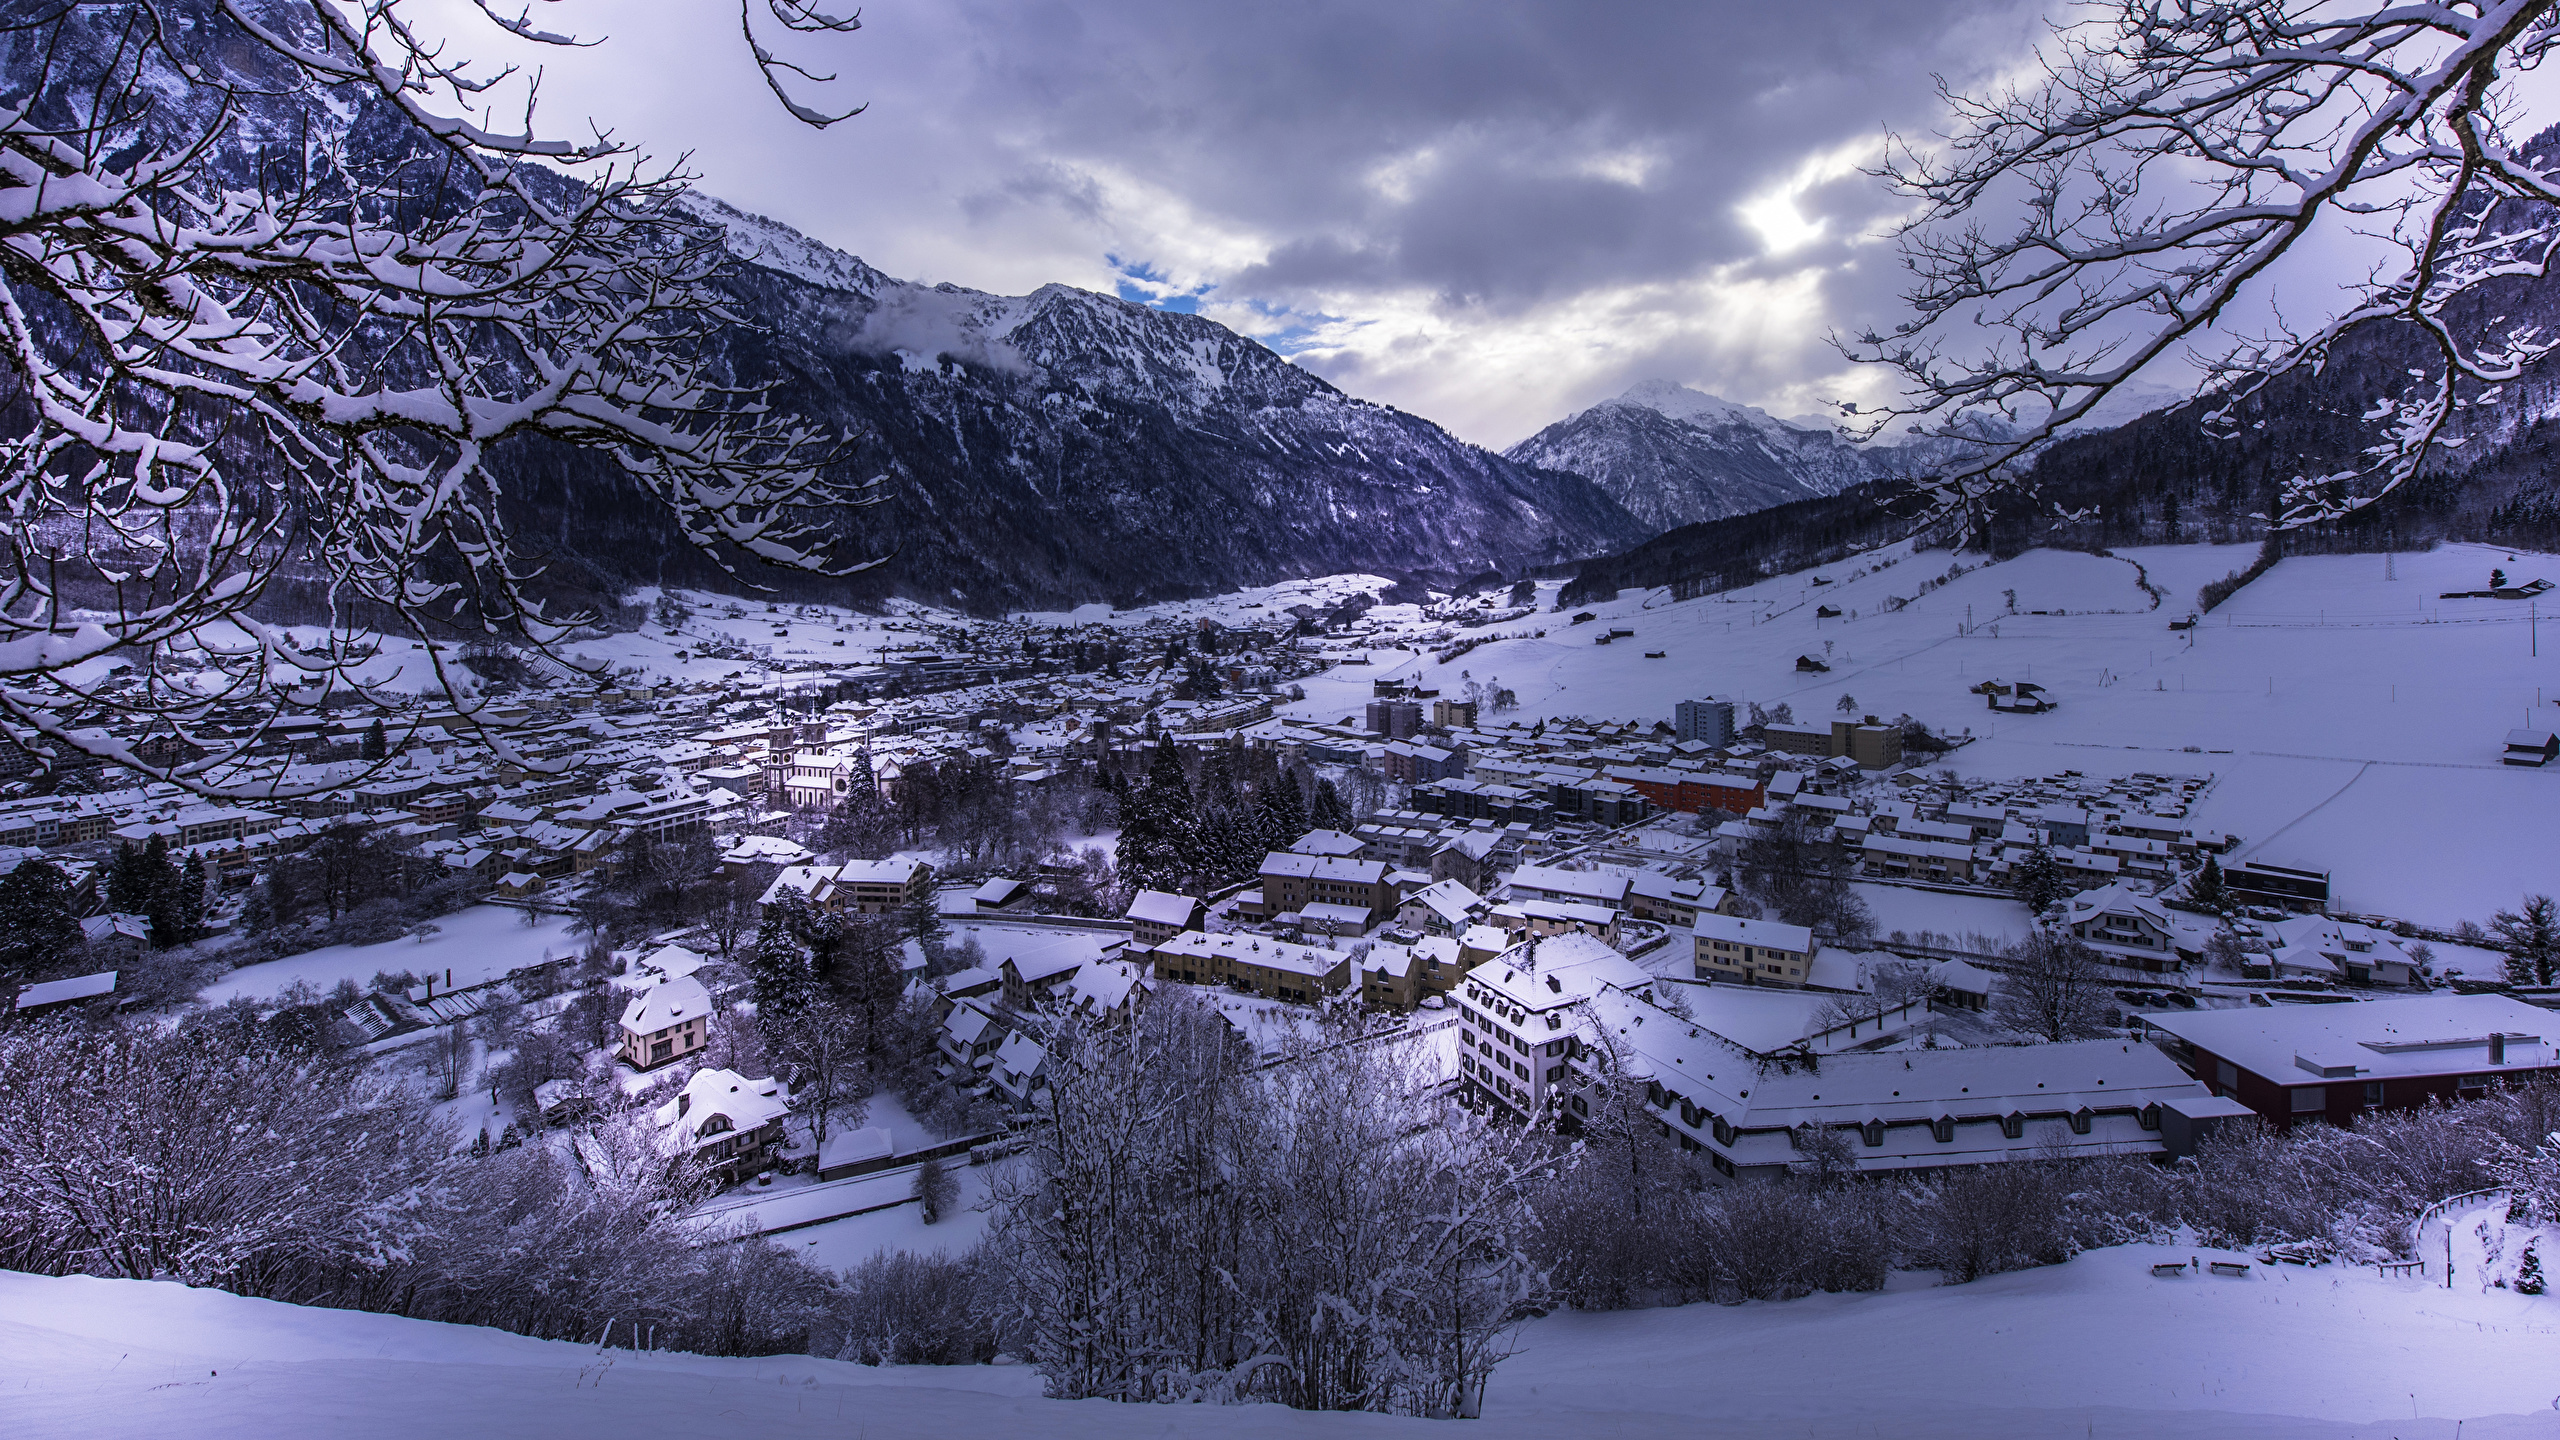 Sfondi Svizzera Glarus Inverno Montagna Neve Citta La Casa 2560x1440